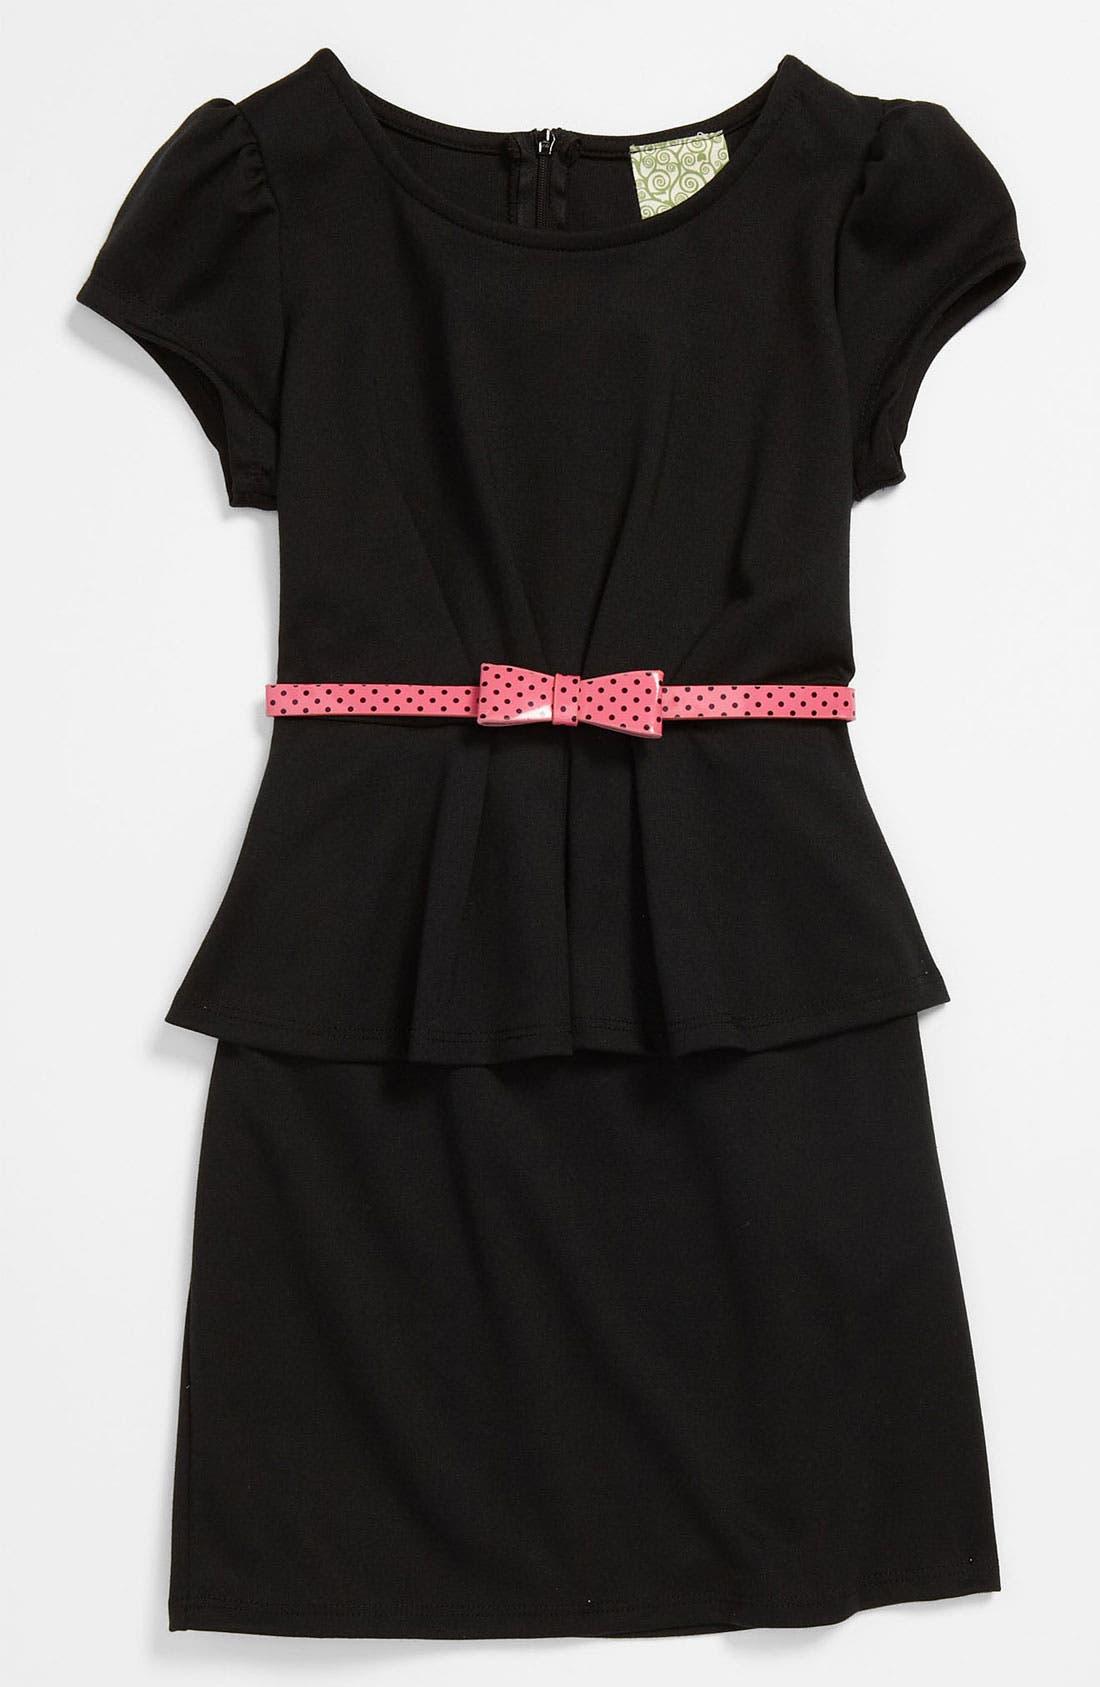 Alternate Image 1 Selected - Kiddo Knit Peplum Dress (Big Girls)